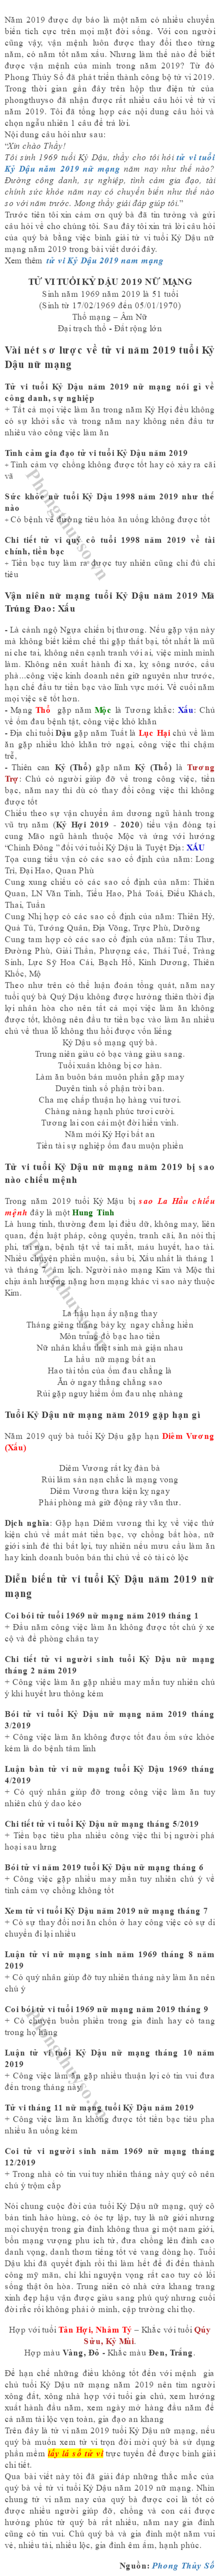 tu-vi-tuoi-ky-dau-nam-2019-nu-mang